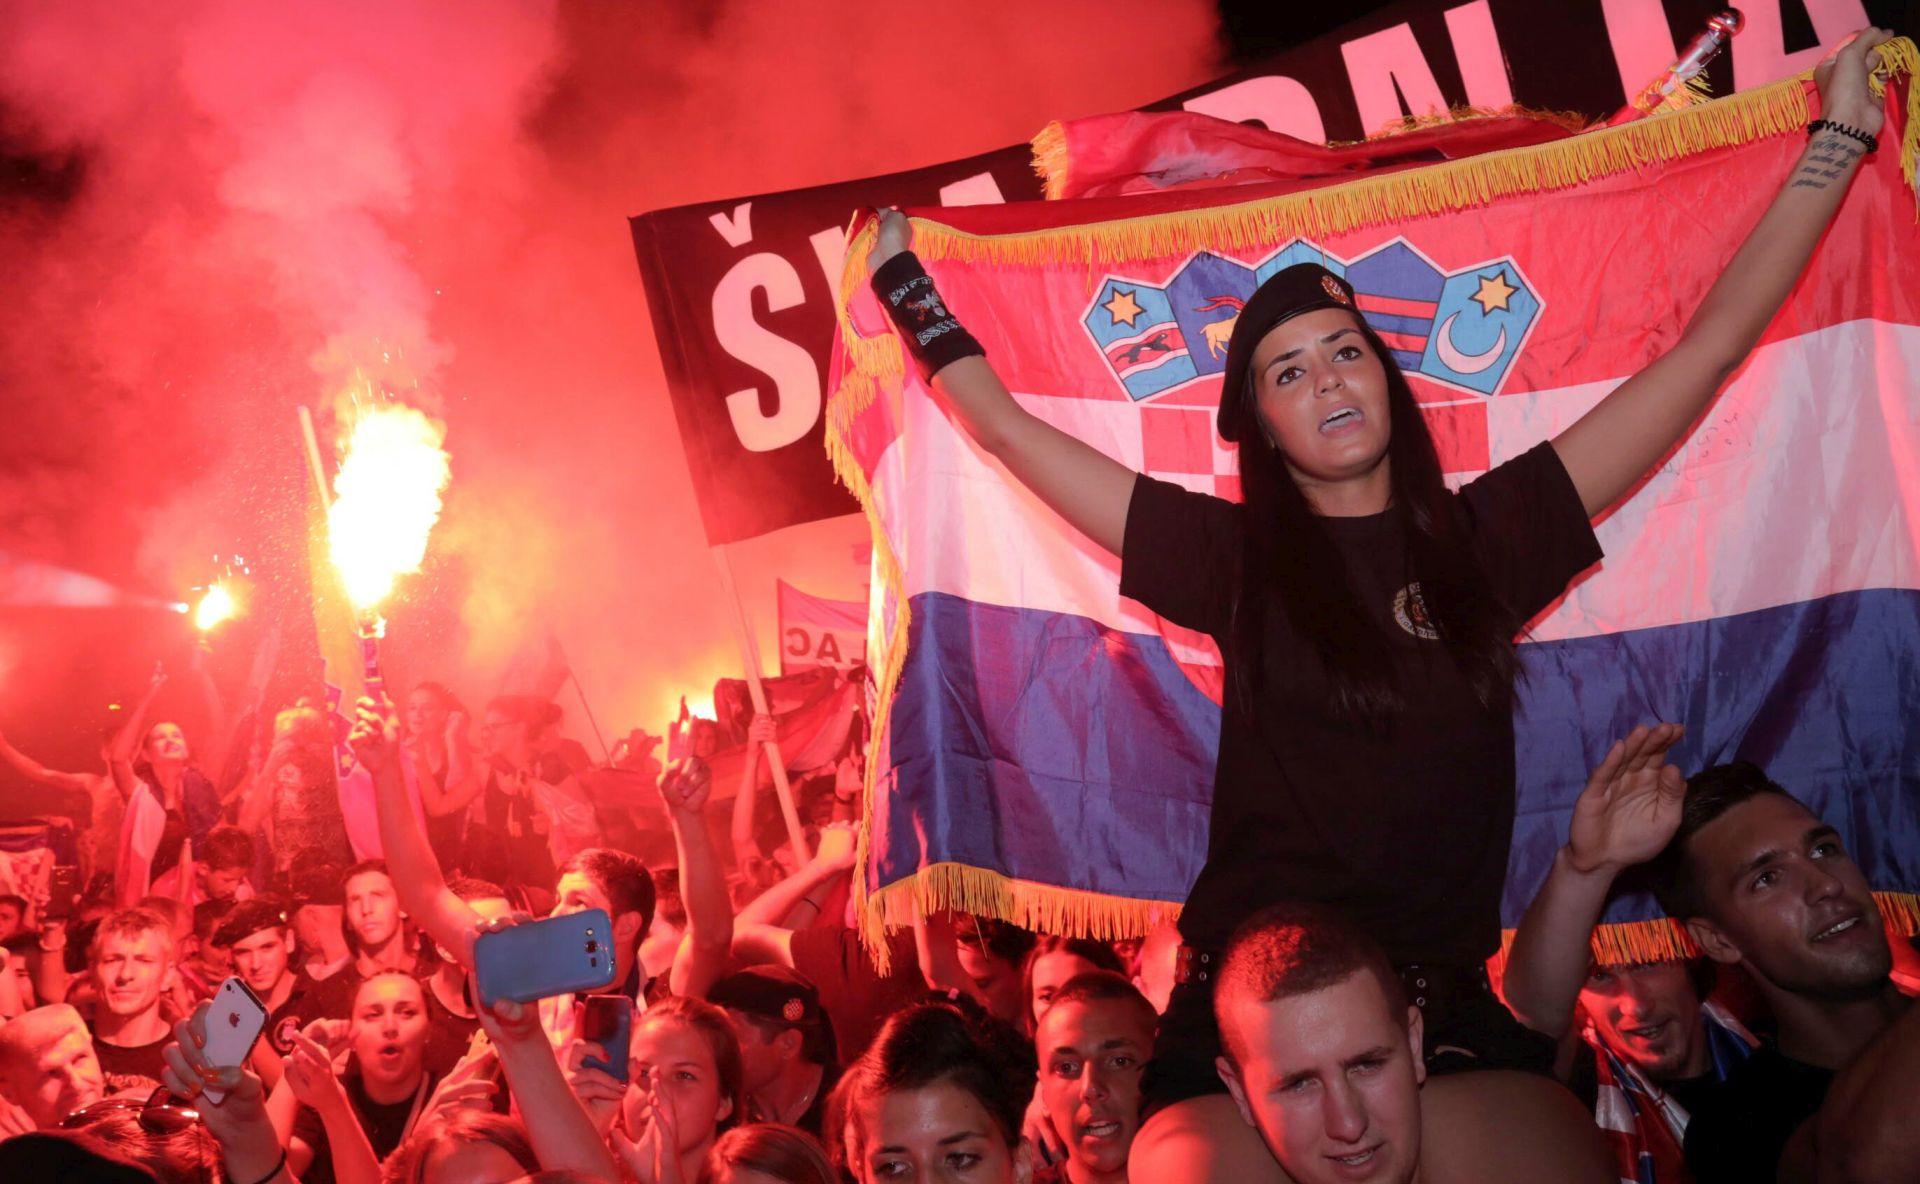 NEZAOBILAZNA KOREOGRAFIJA: Na Thompsonovom koncertu bilo ustaških kapa i zastava